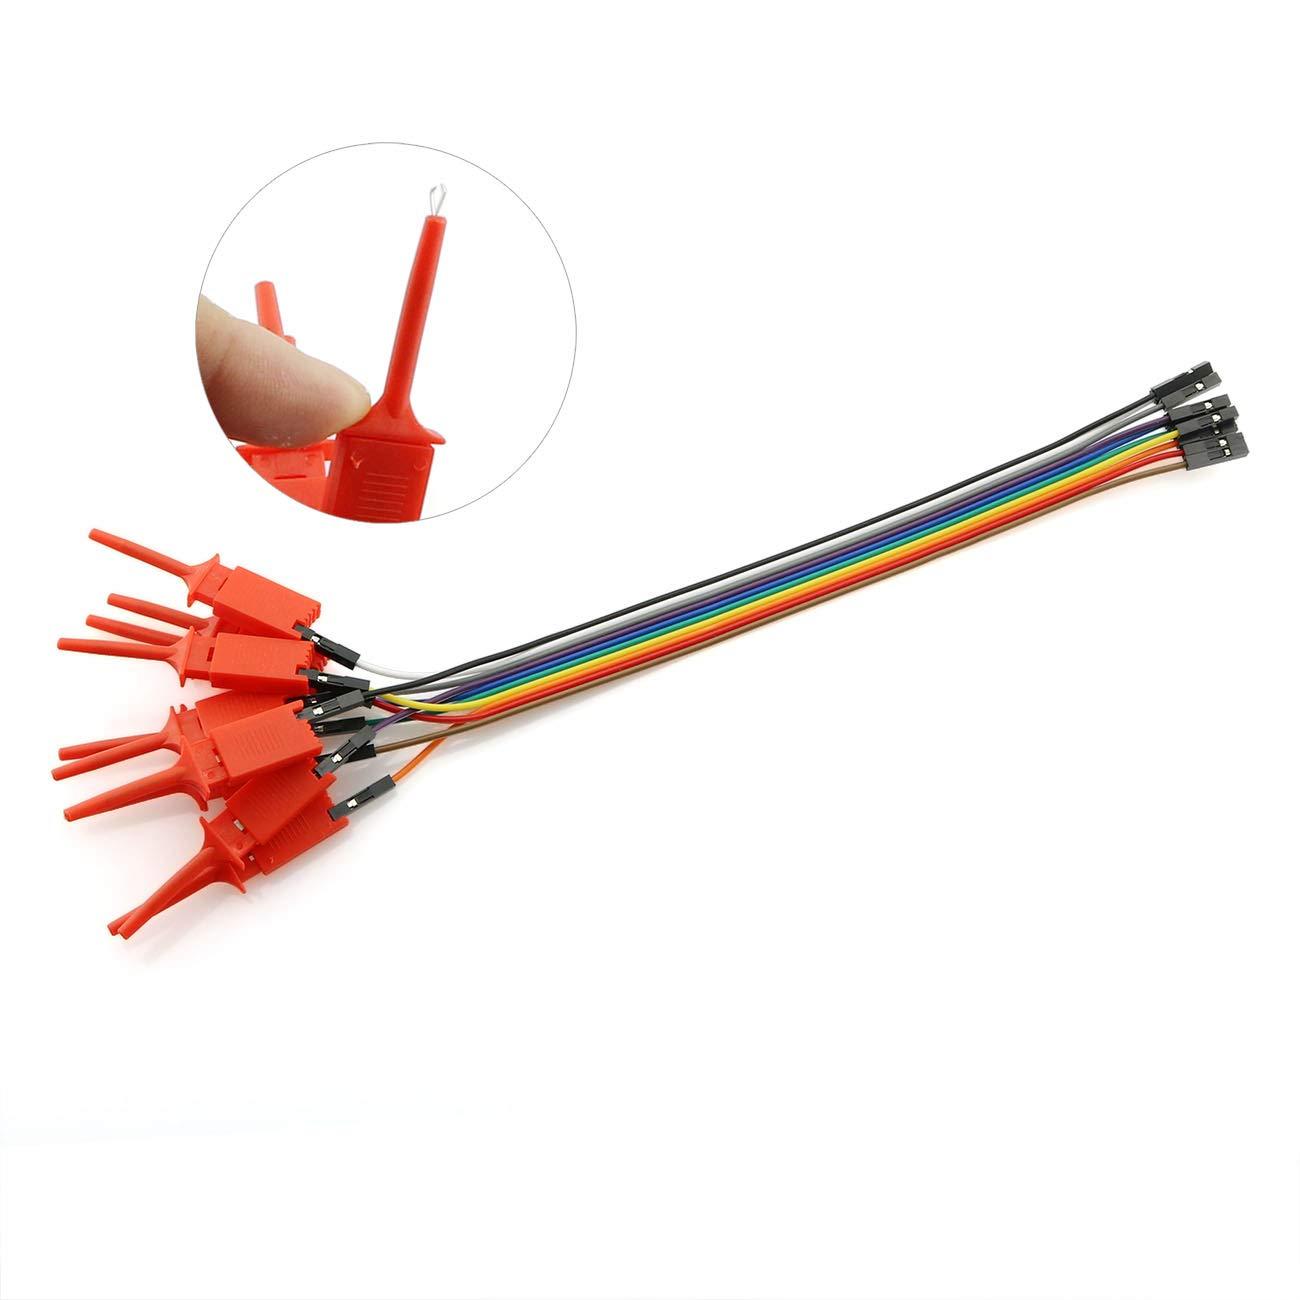 10pcs Round Test Hook Clip Grabbers Test Probe SMD IC SMT For Multimeter R+B